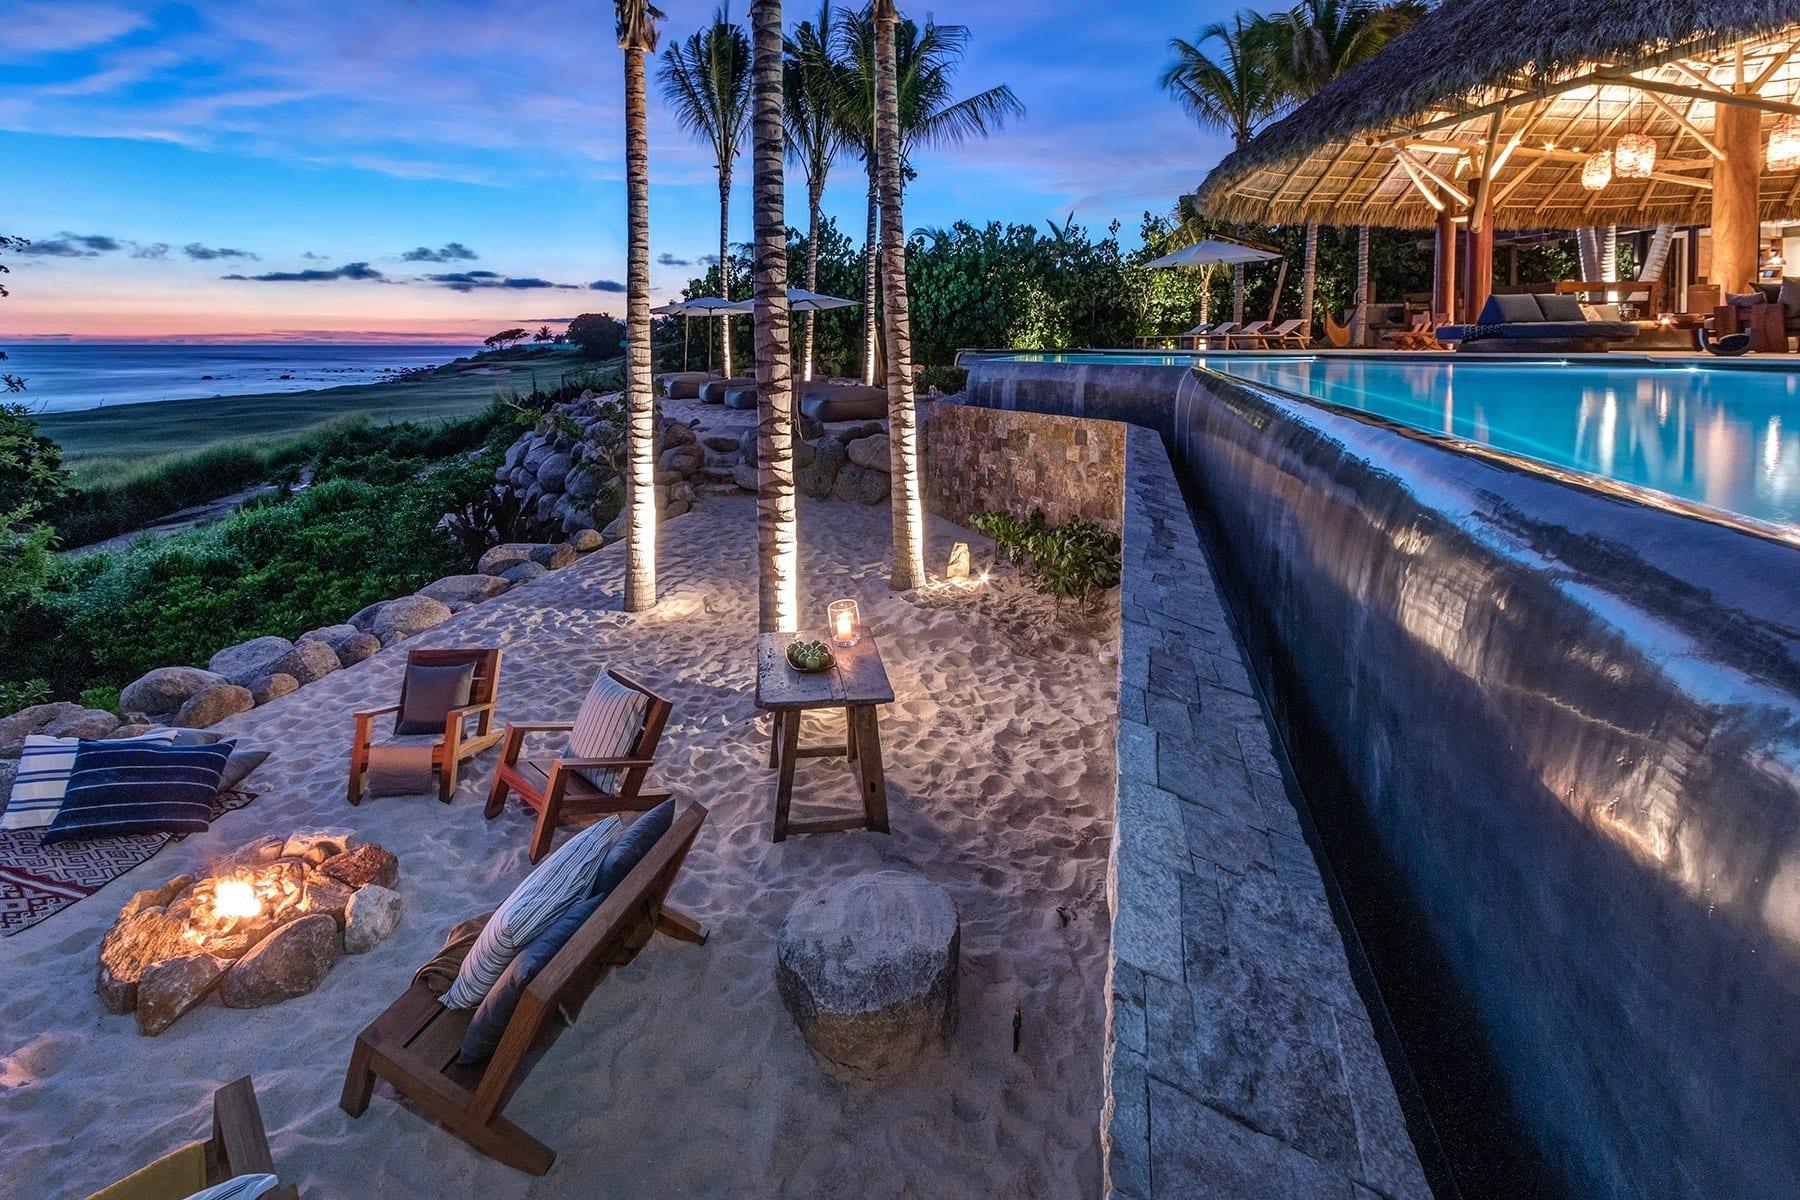 Casa Koko Sand Terrace Firepit Sunset